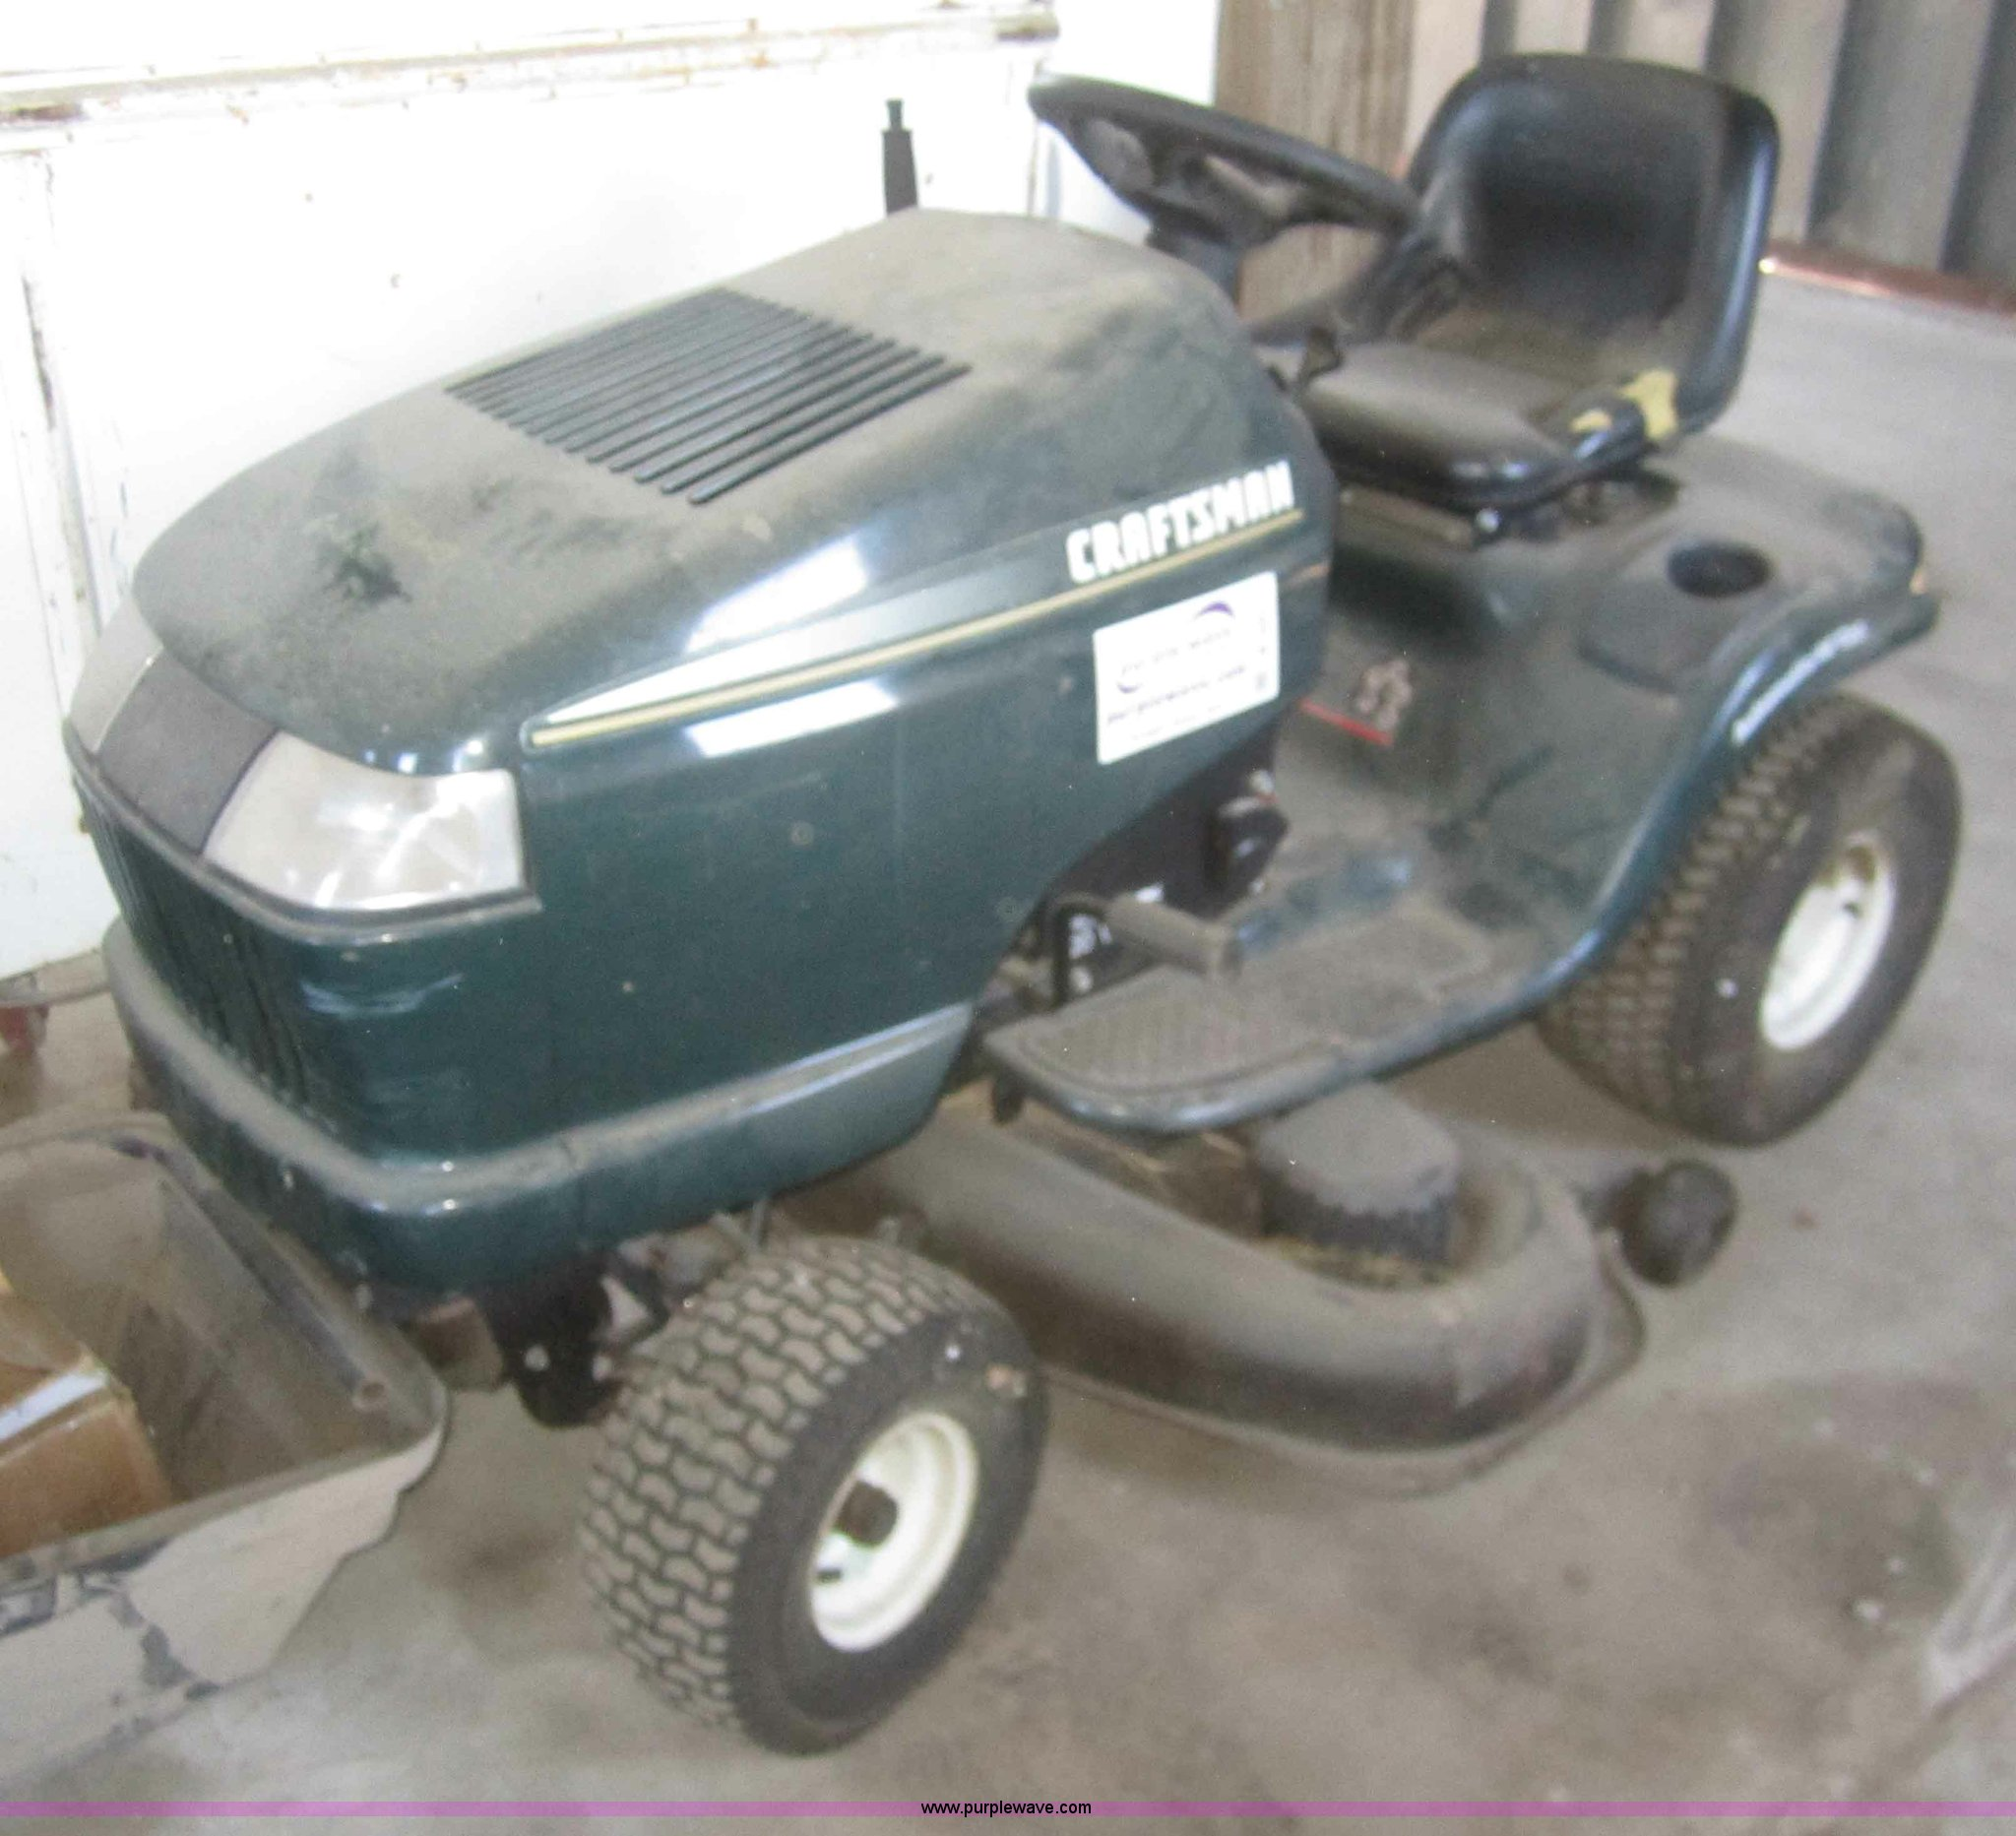 1999 Craftsman 917 272140 Lawn Mower Item B5677 3 13 2012